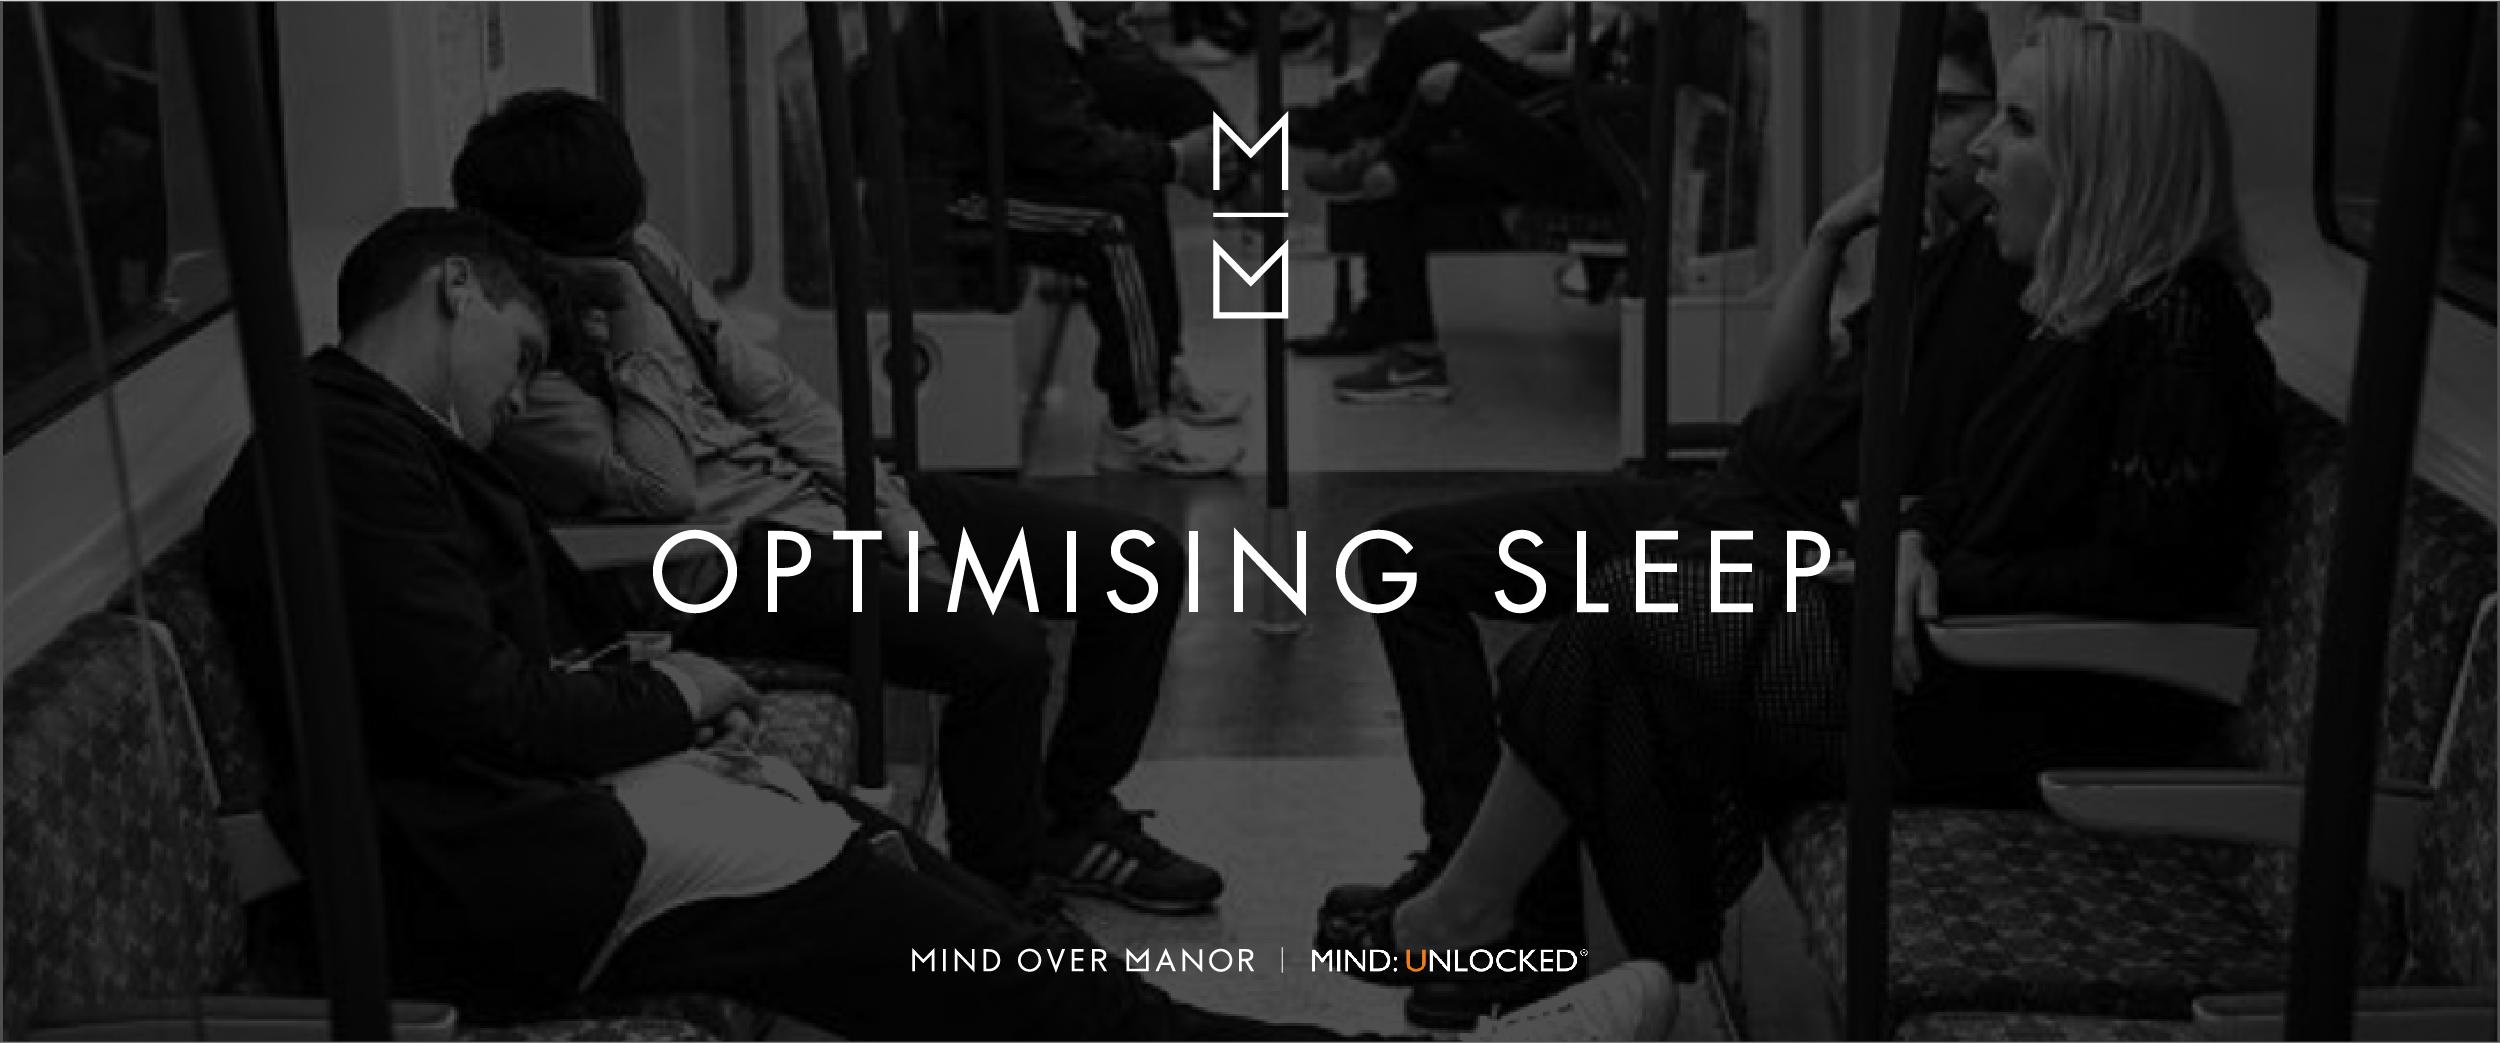 Mind_Over_Manor-01.jpg